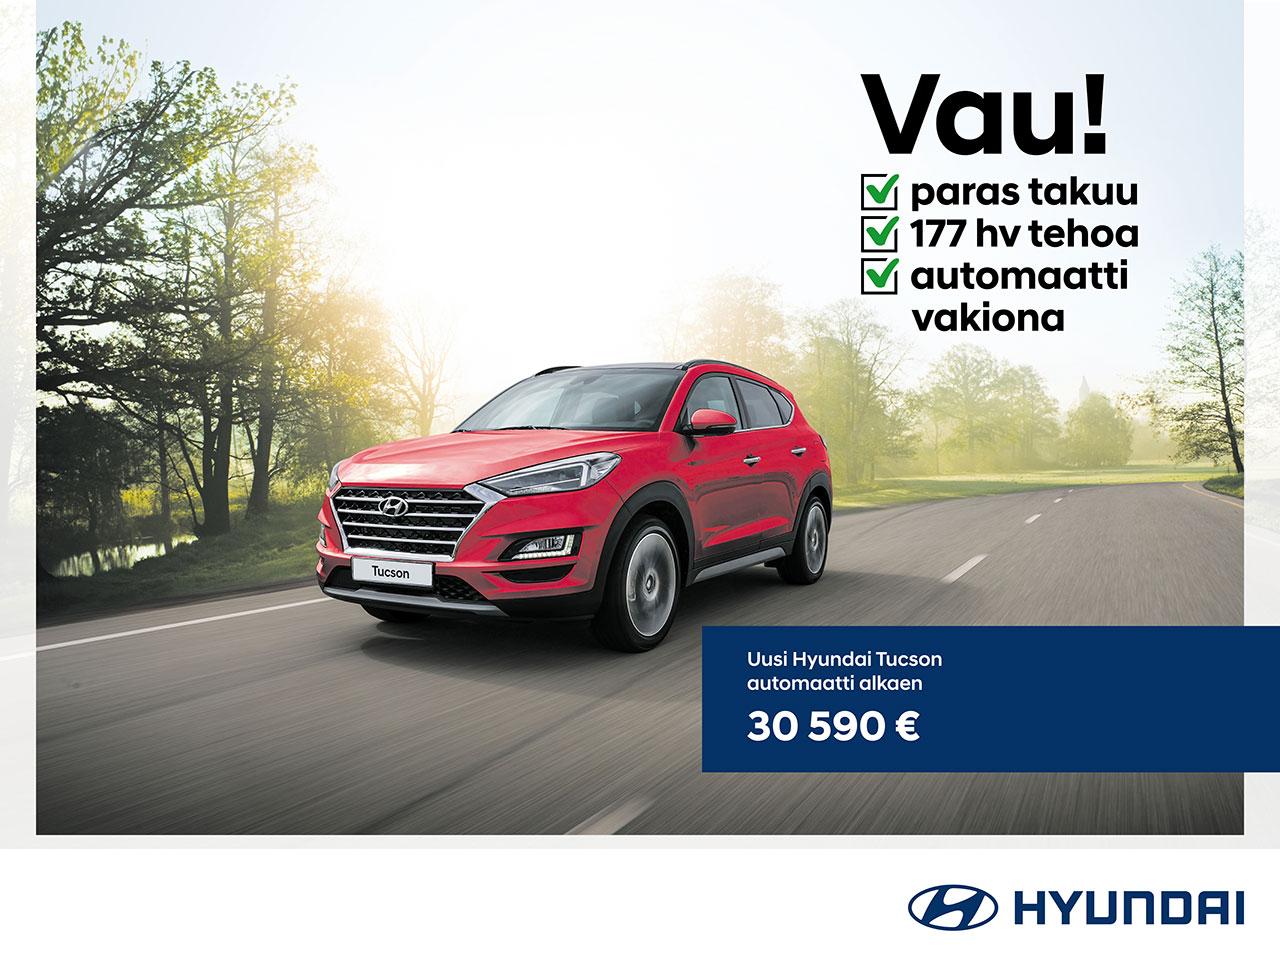 Hyundai Tucson: Tehdas Packit -50%